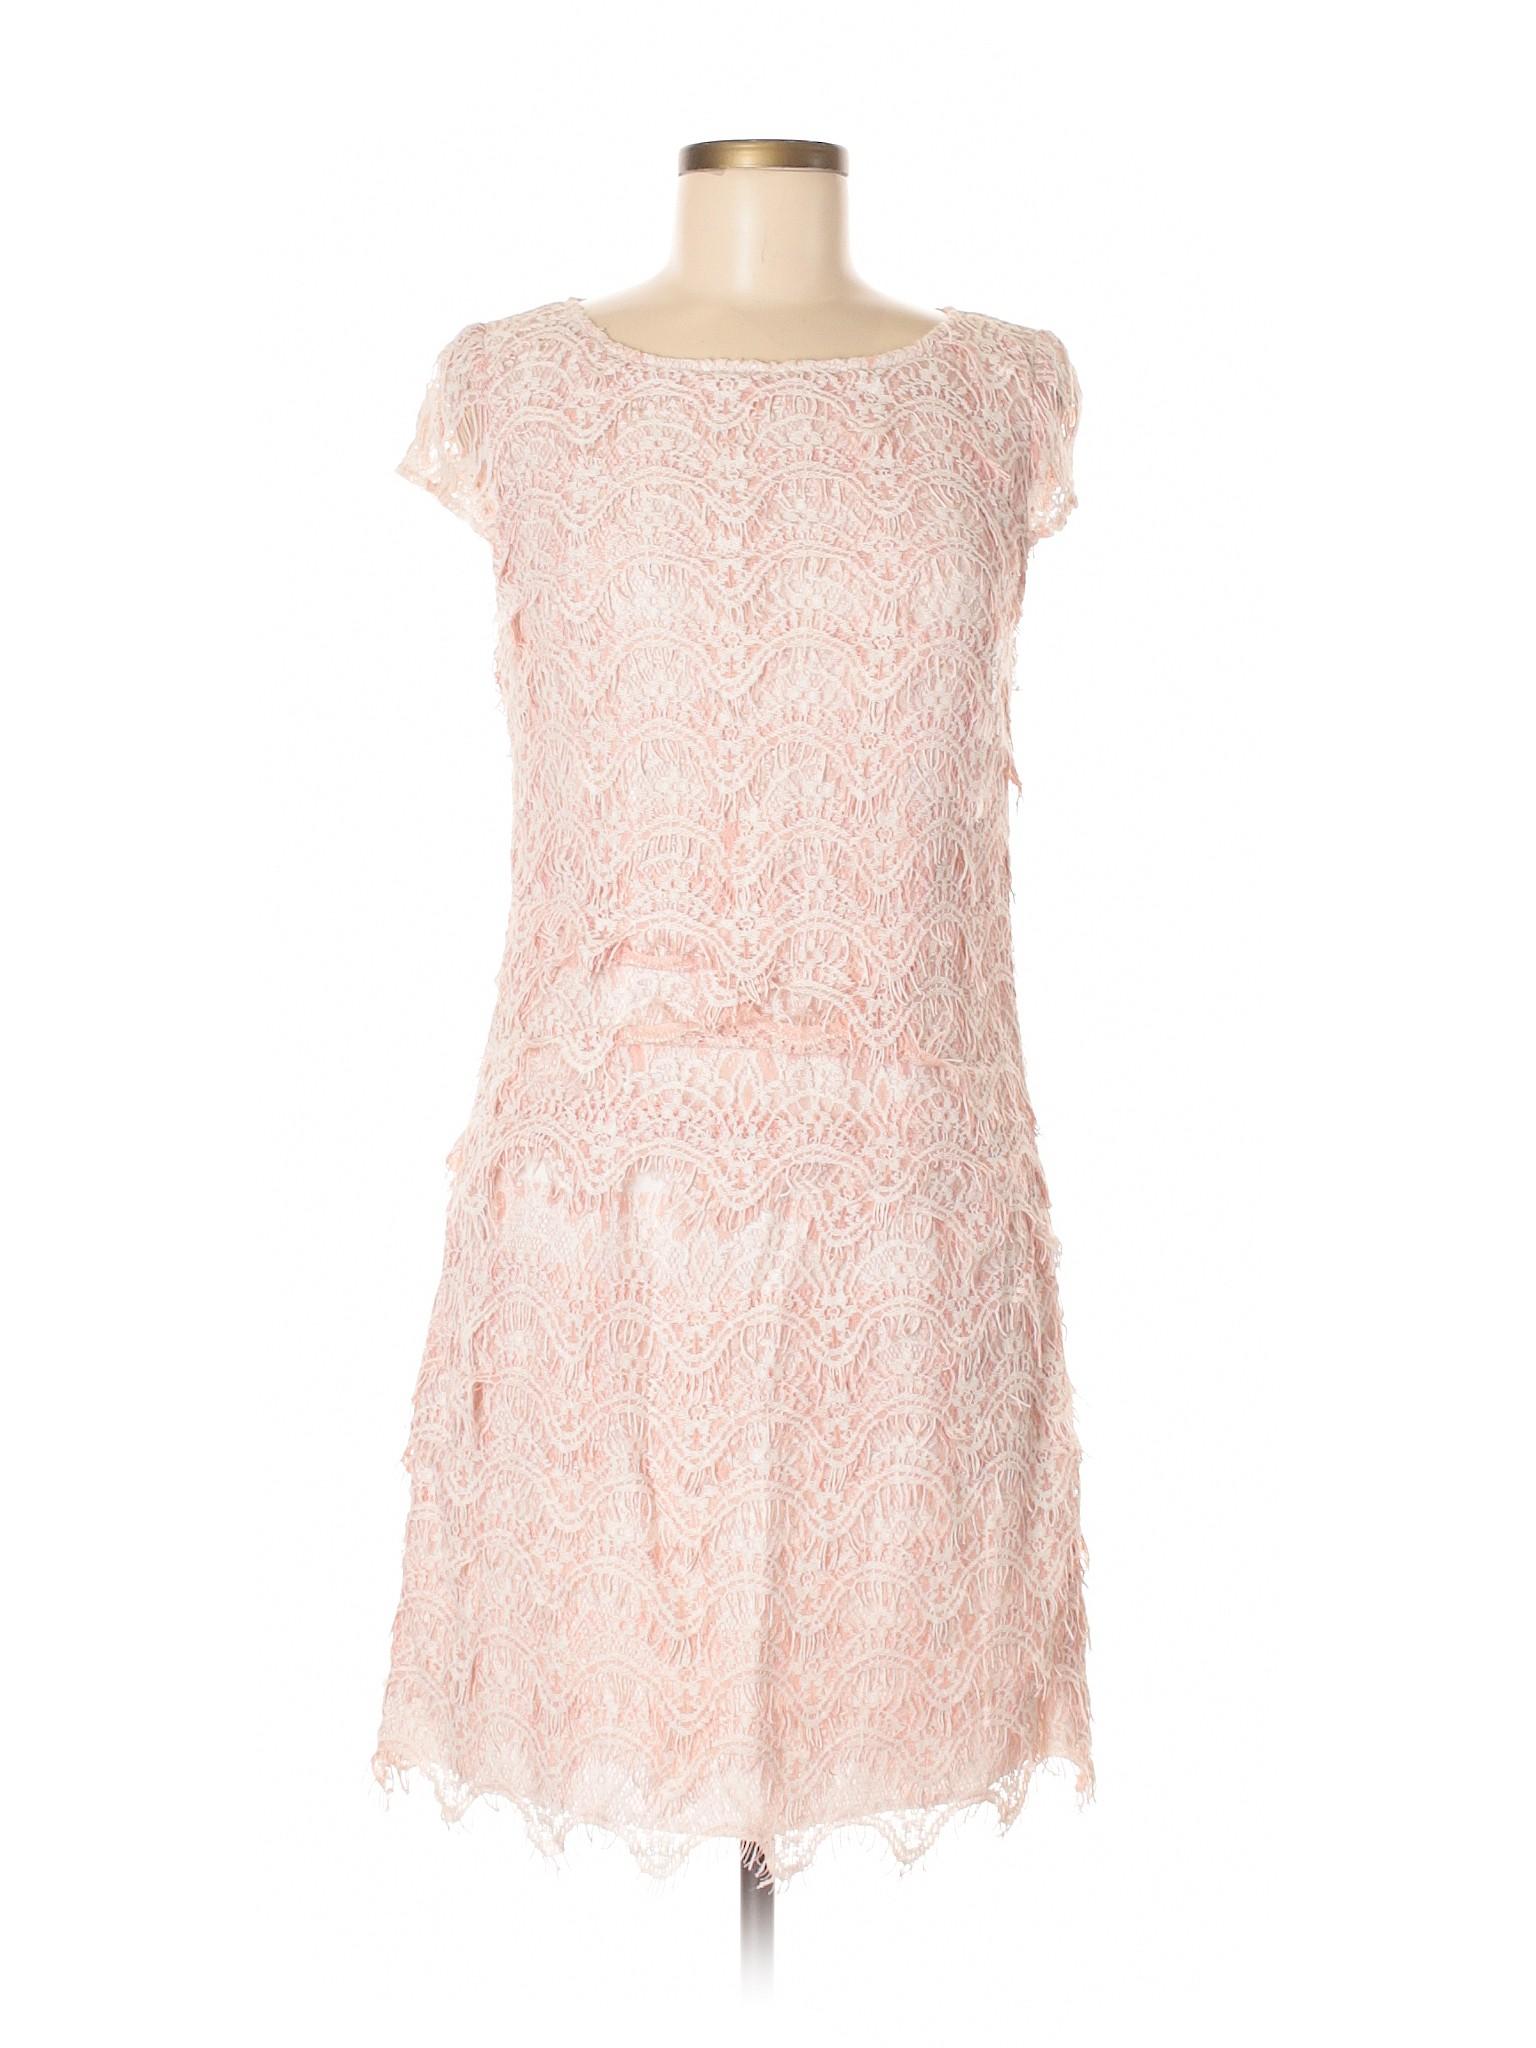 Jax Boutique Boutique Dress Casual winter winter Jax HnT1Z